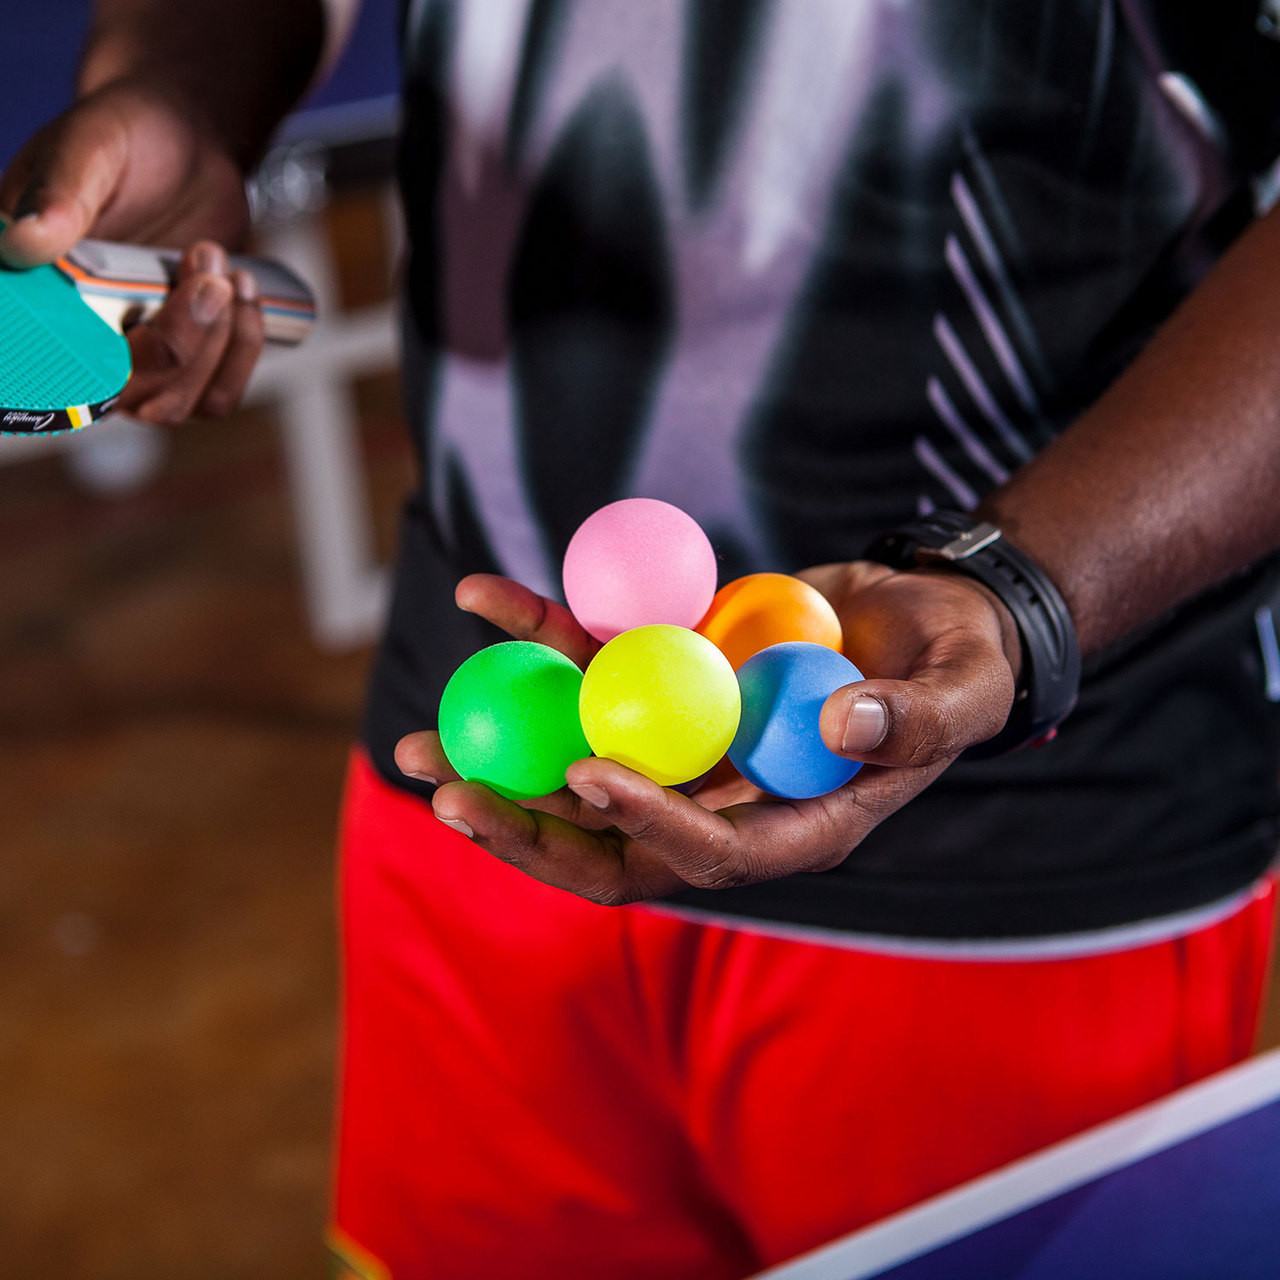 Rhino 1 Star Rainbow Table Tennis Balls